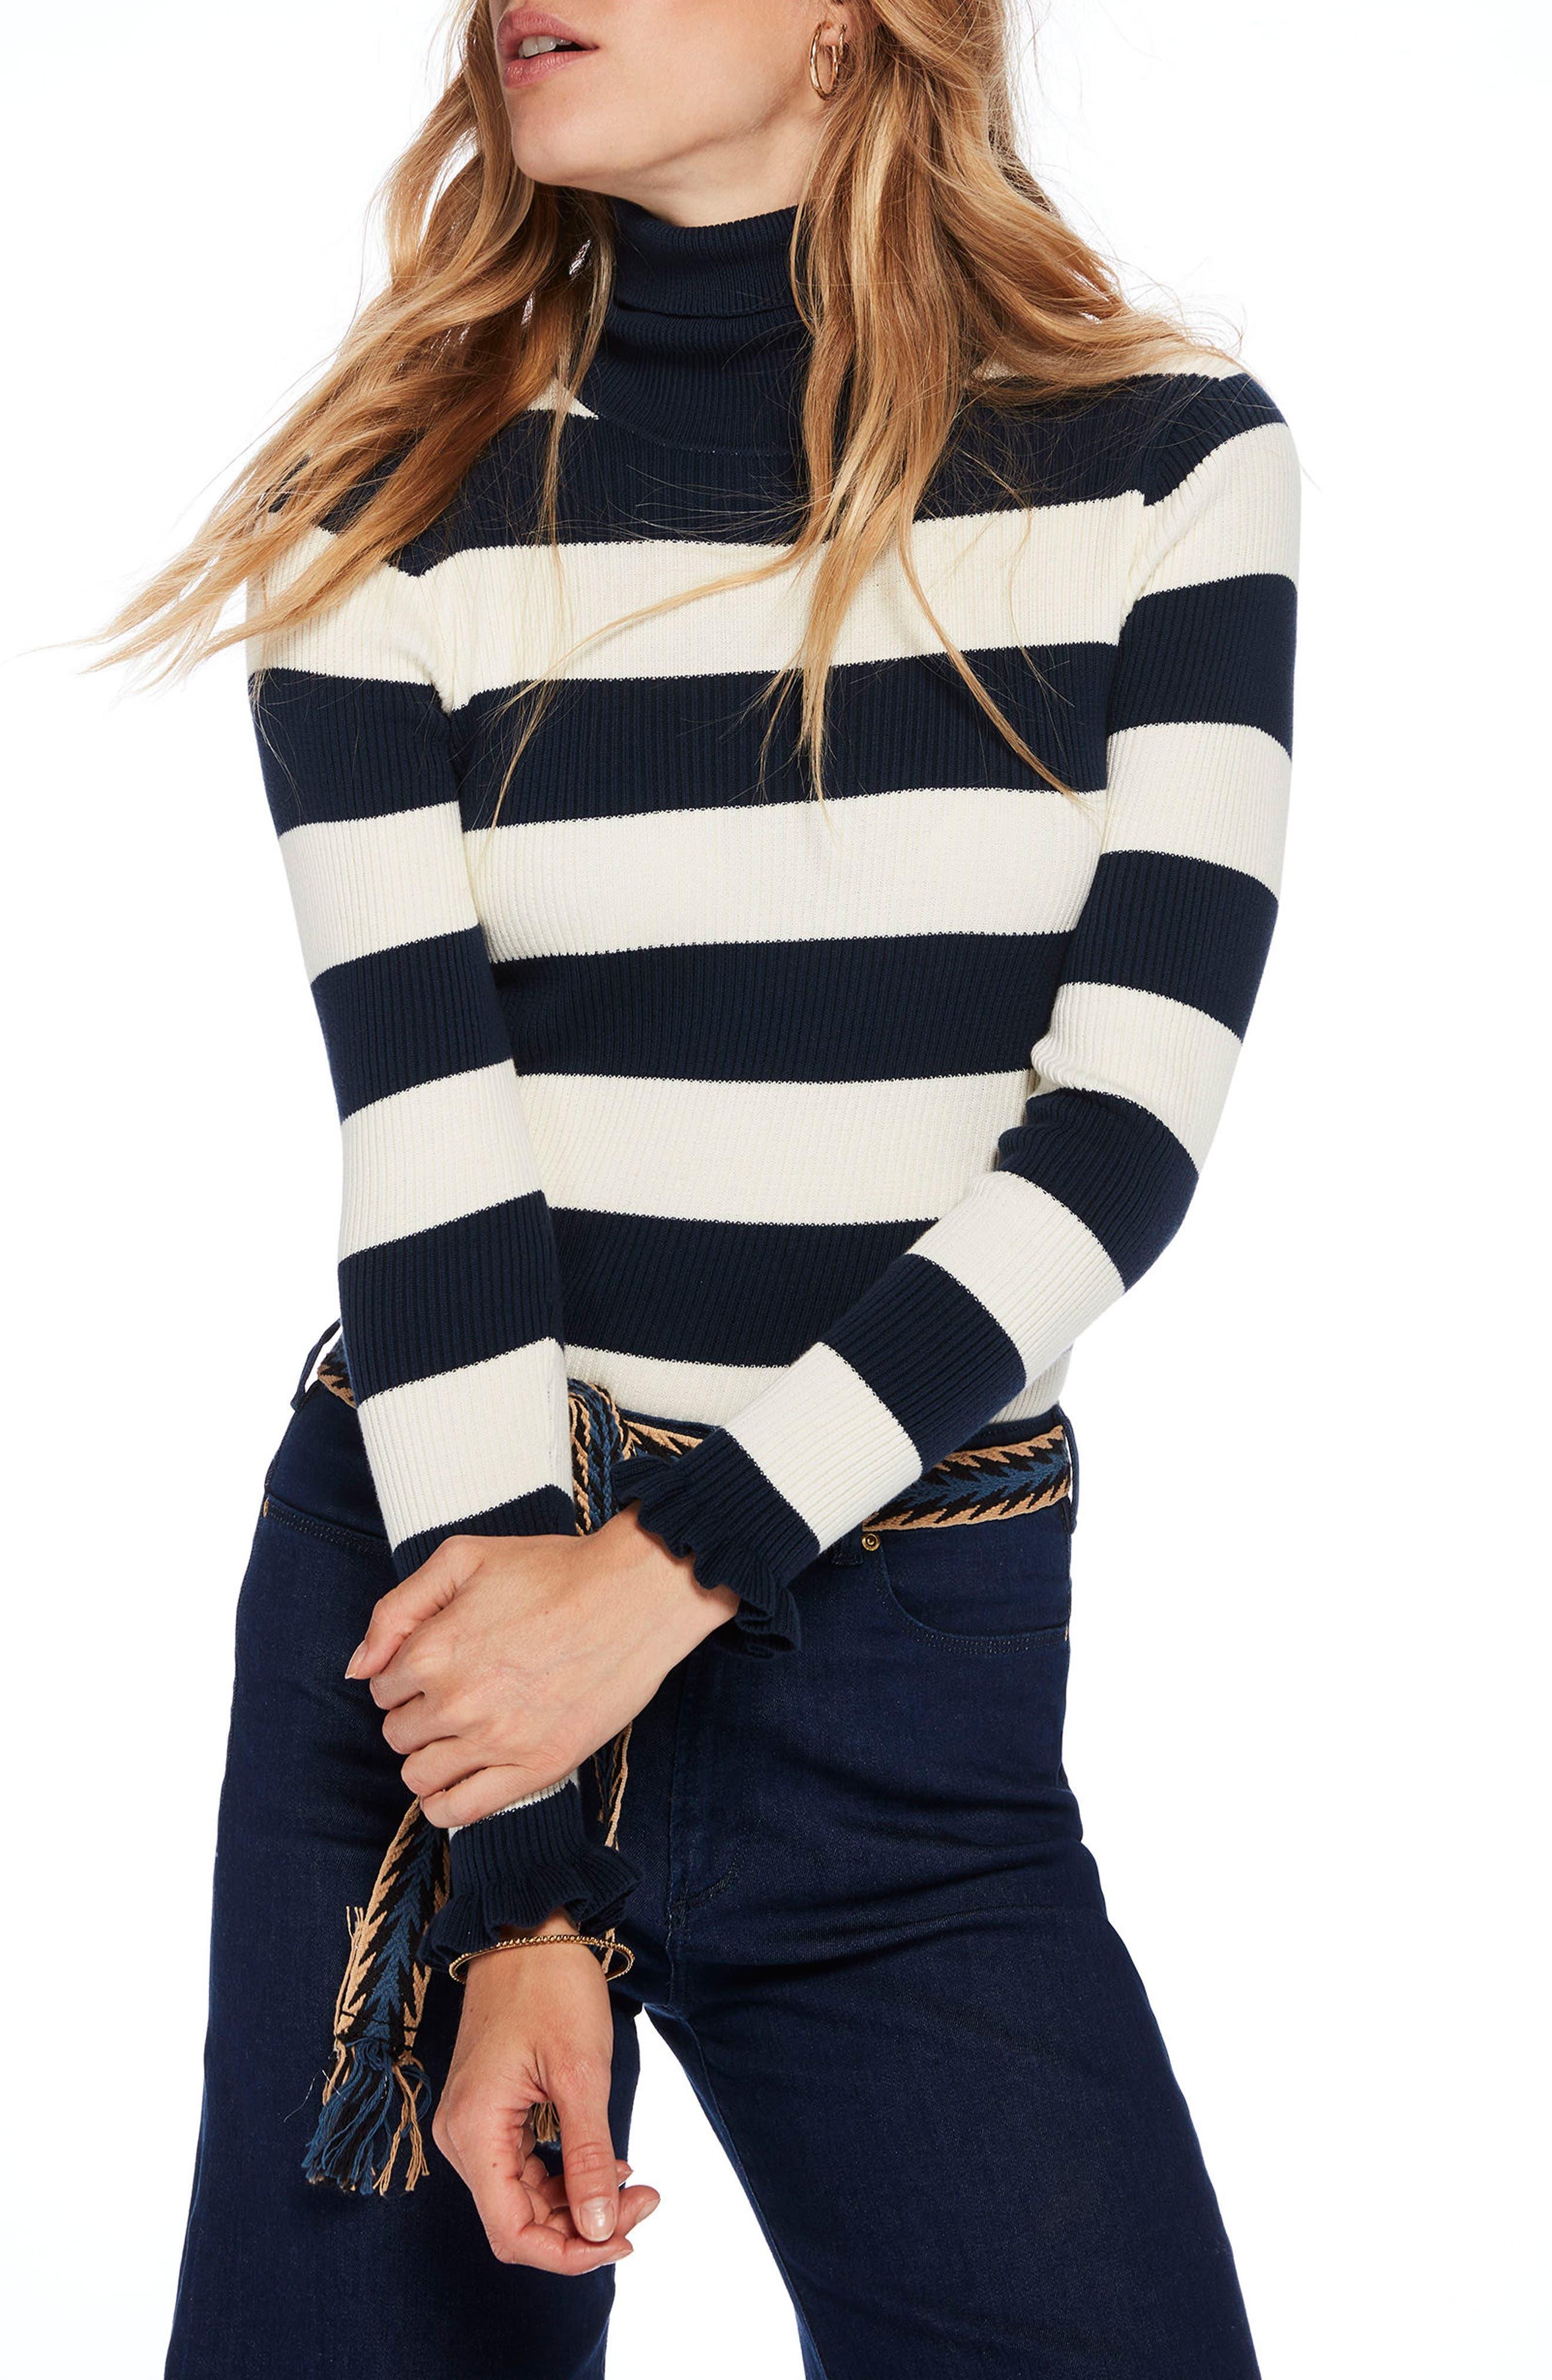 Stripe Turtleneck,                             Main thumbnail 1, color,                             Navy/ Off White Thick Stripe